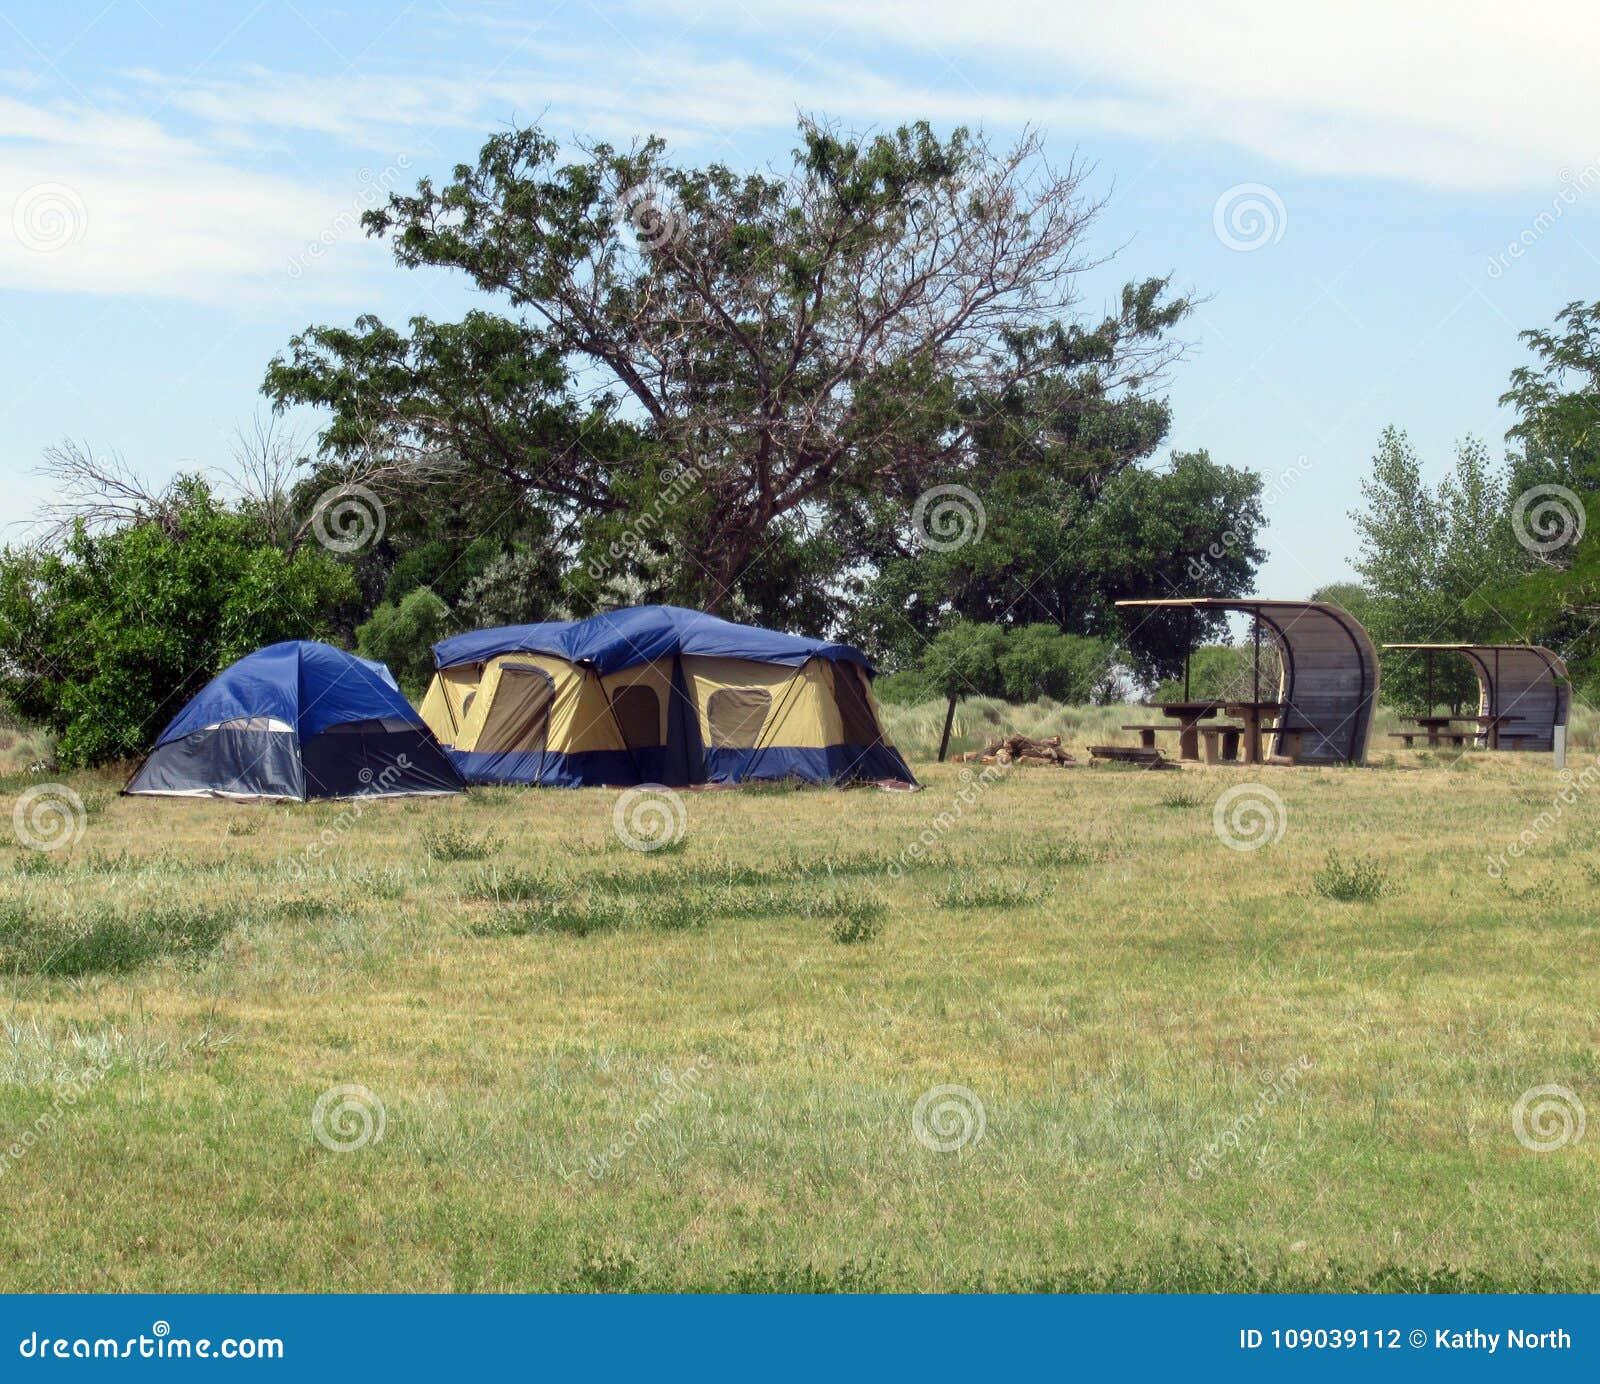 Barracas do acampamento e tabelas de piquenique